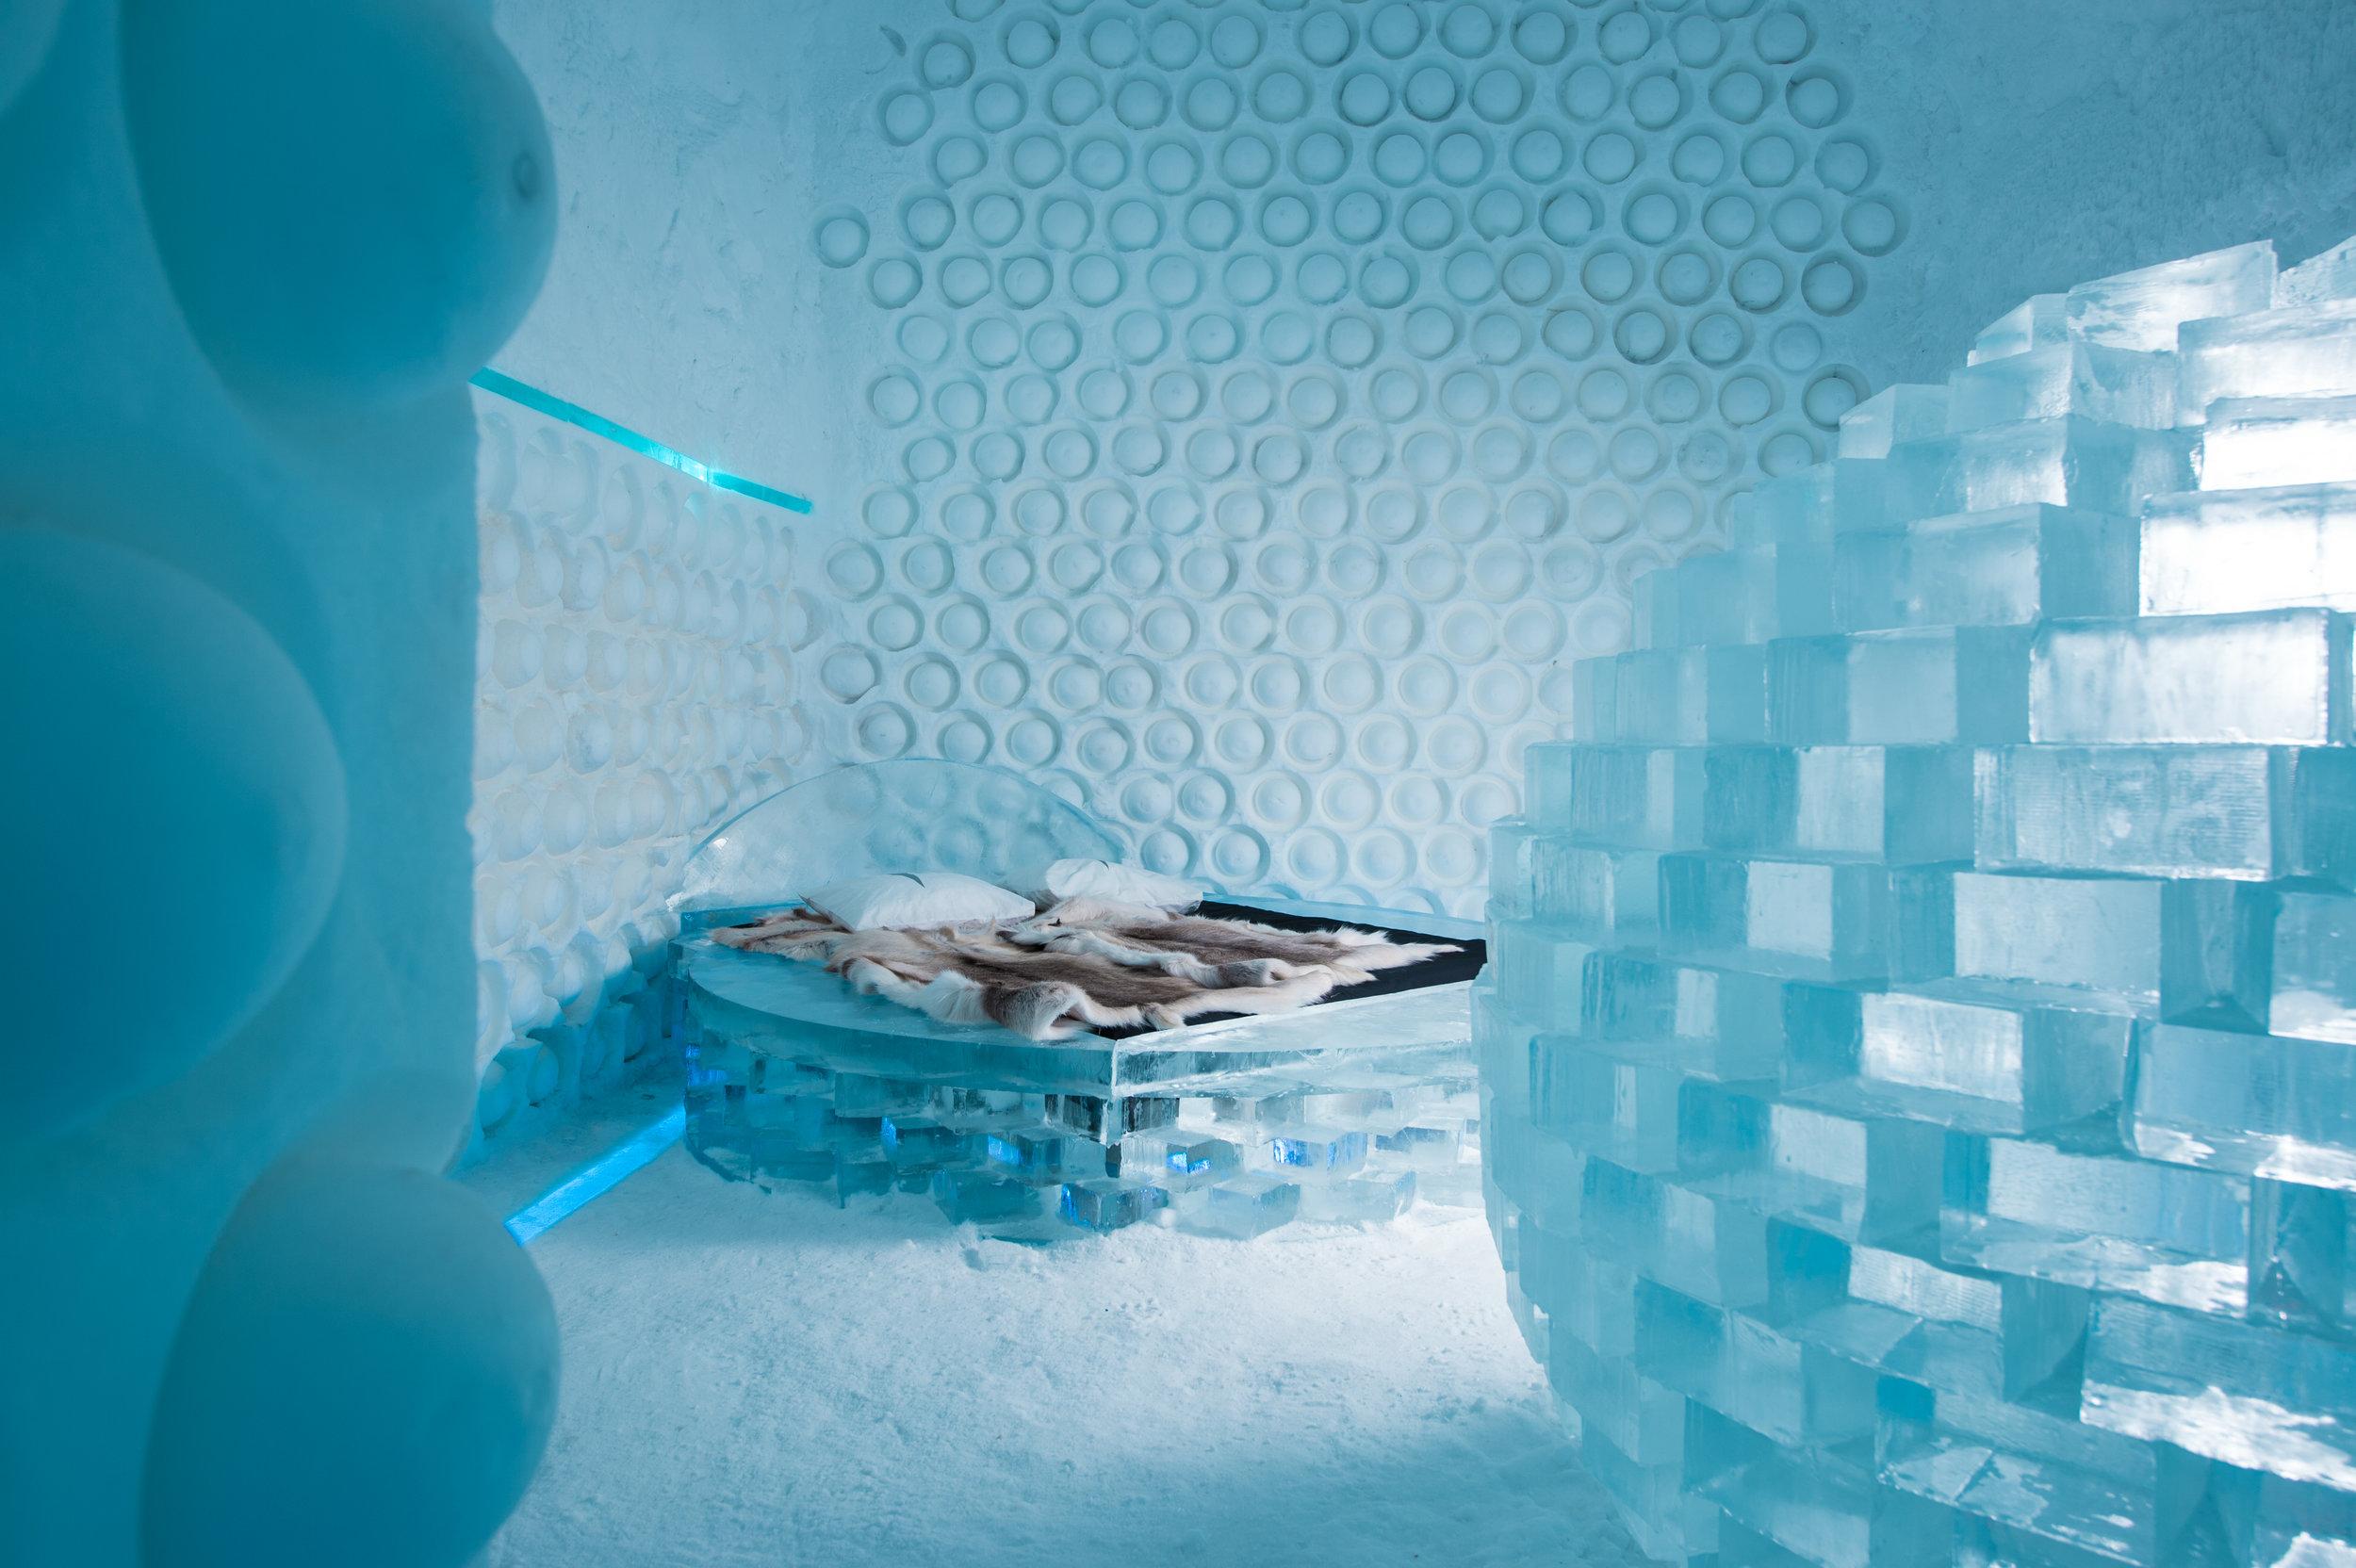 Rob & Timsam Harding, Melting Pot--ICEHOTEL 365 photo by - Asaf Kliger (3 of 4) (1 of 3).jpg